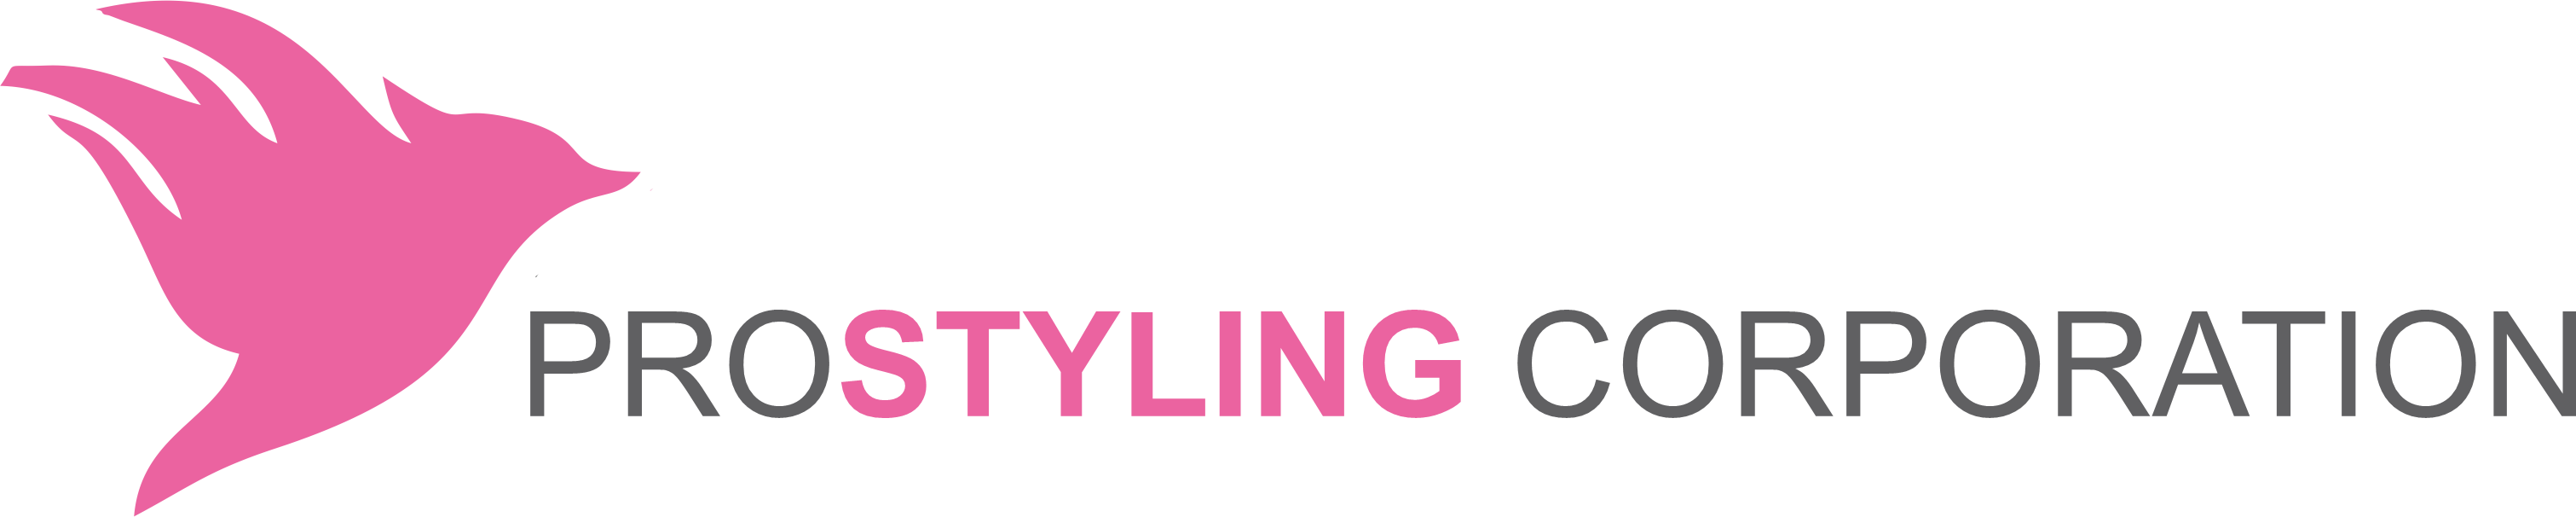 Pro Styling Corporation